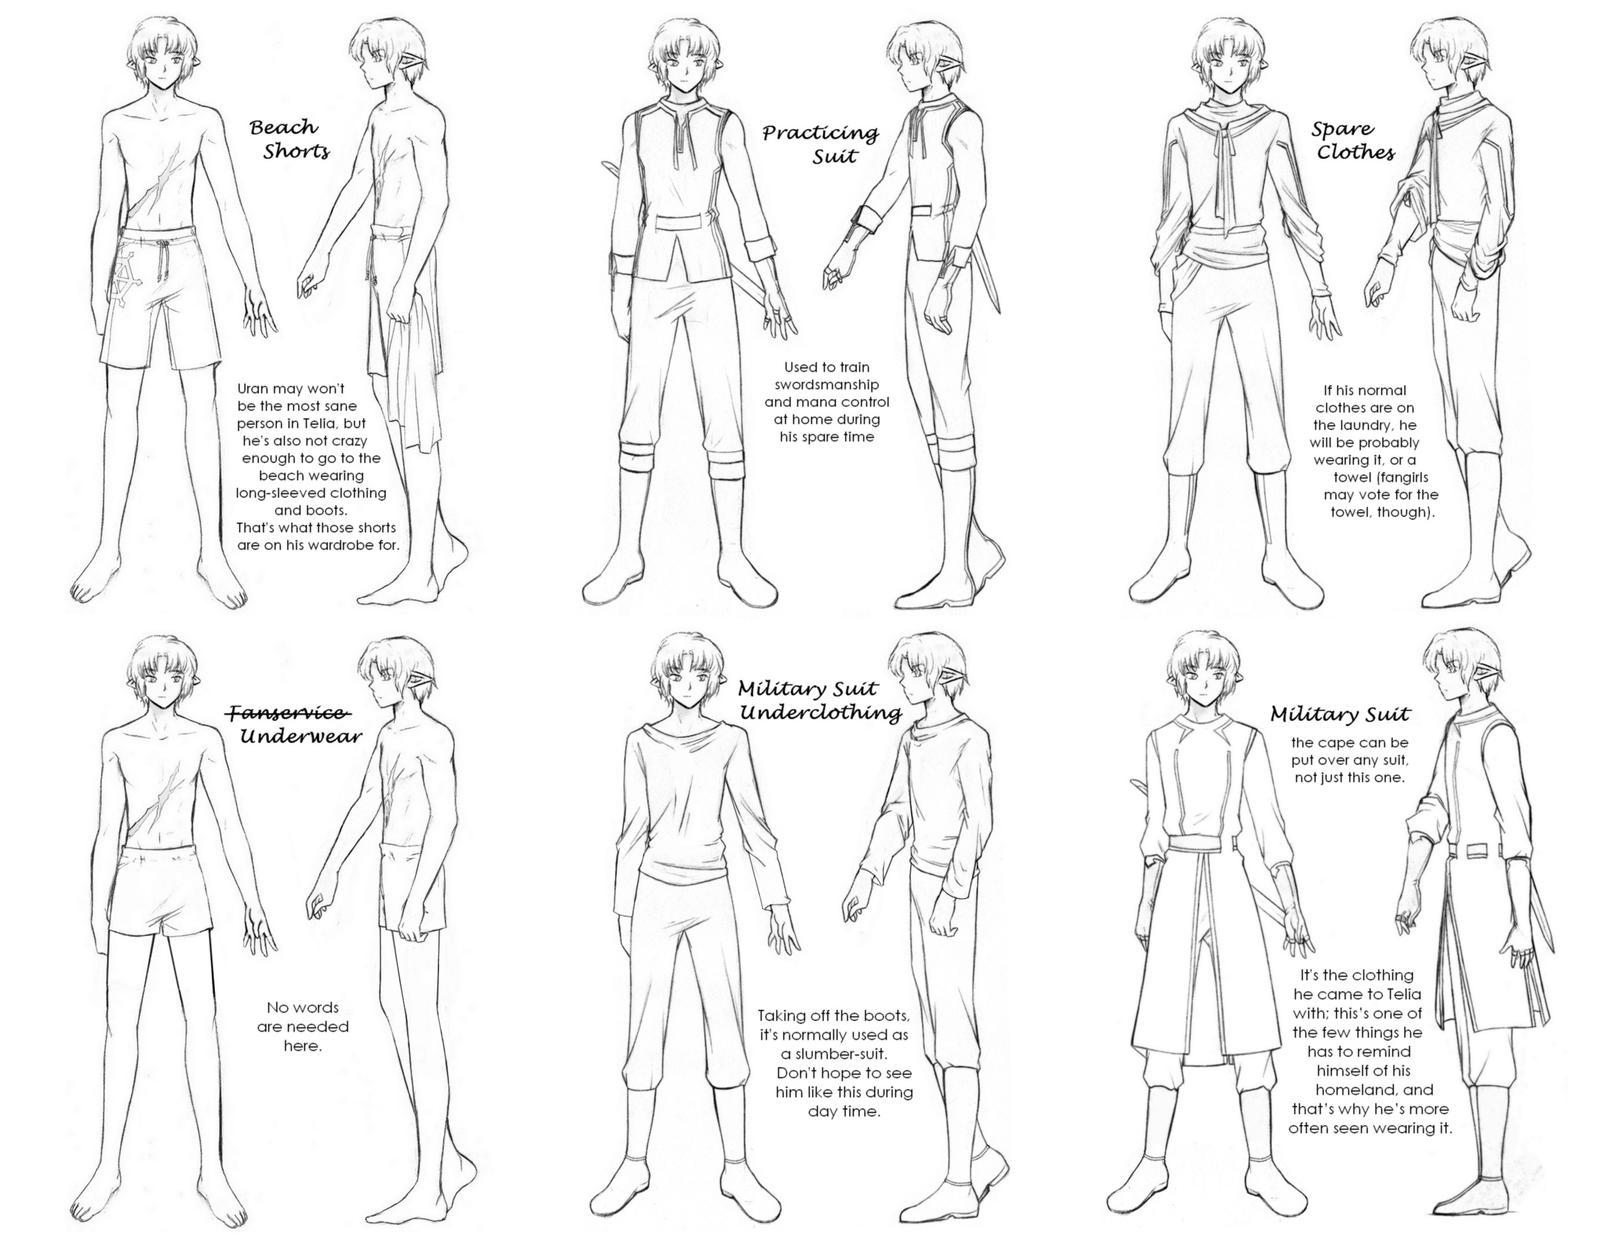 manga character template - reference sheet uran 39 s closet by awa303 on deviantart